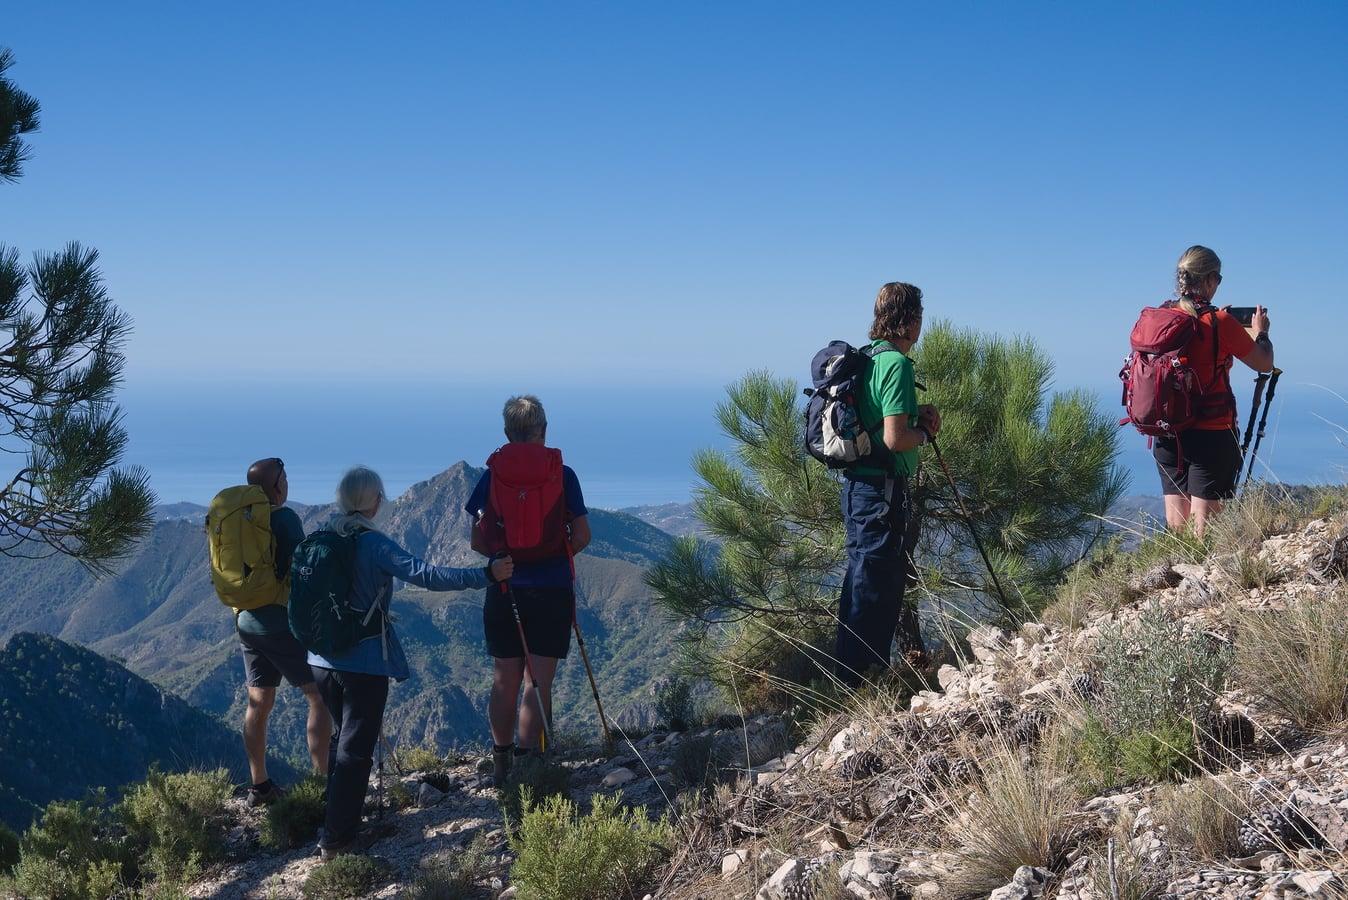 Above the Puerto de Frigiliana to the Sea